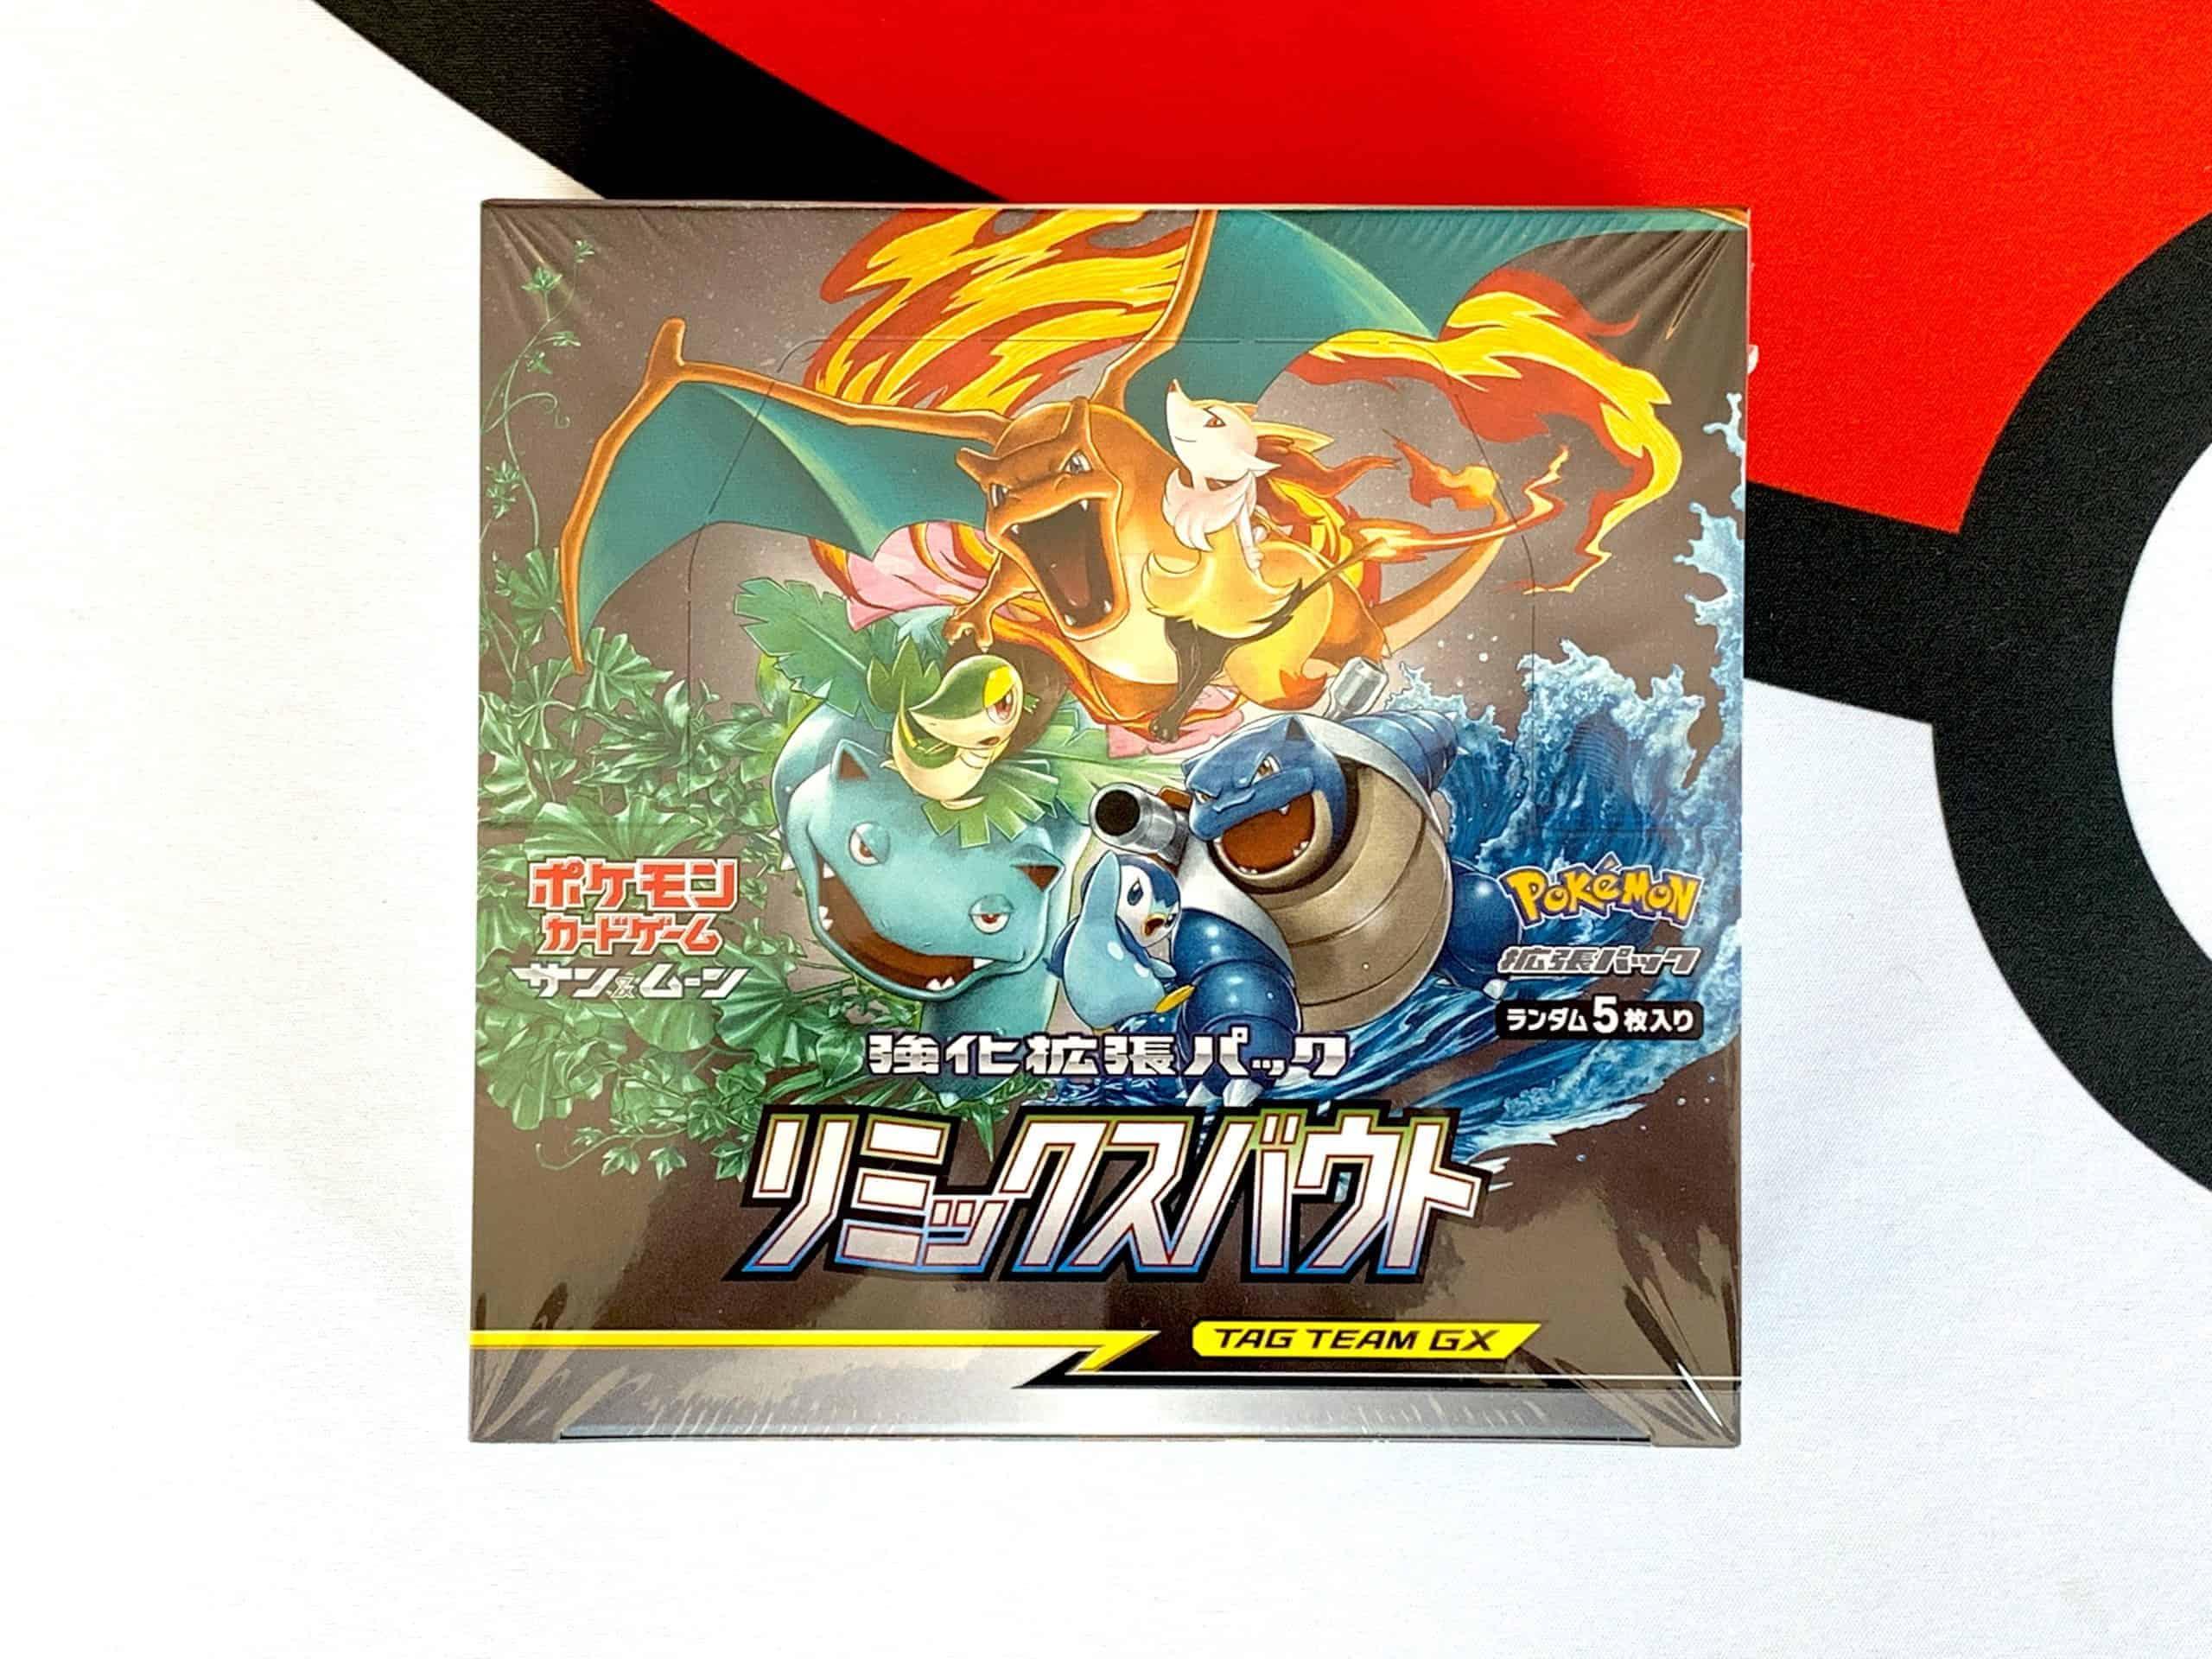 Remix-Bout-SM11a-Booster-Box-Japan-Front-CardCollectors